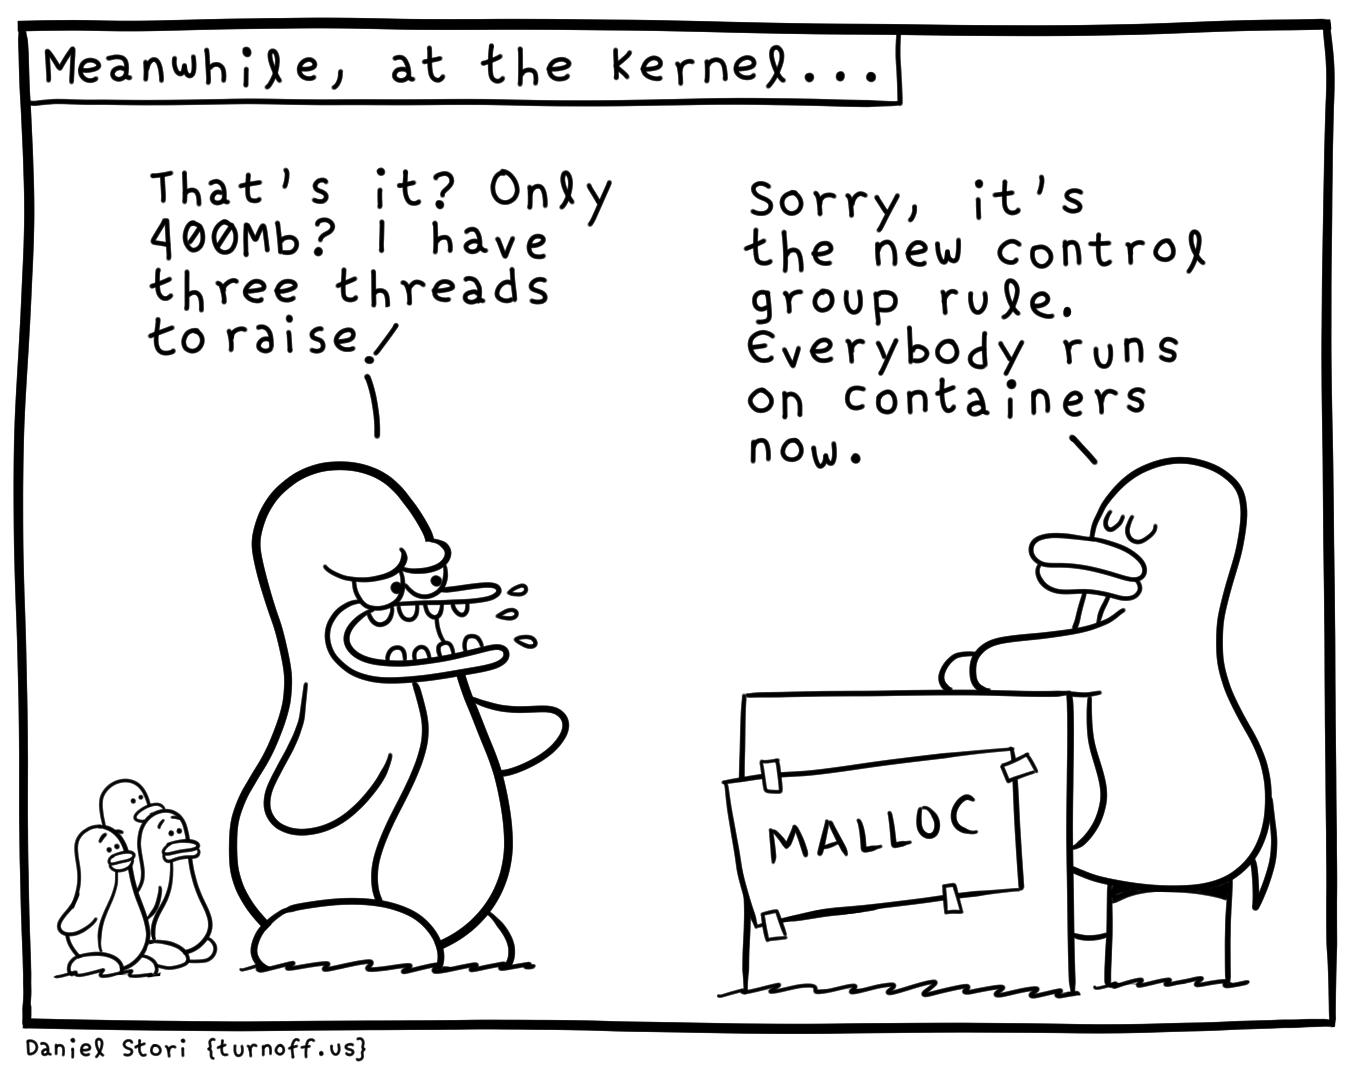 via   the superlative - and economical - developer level programmatical humor of   Daniel Stori   at t  urnoff.us